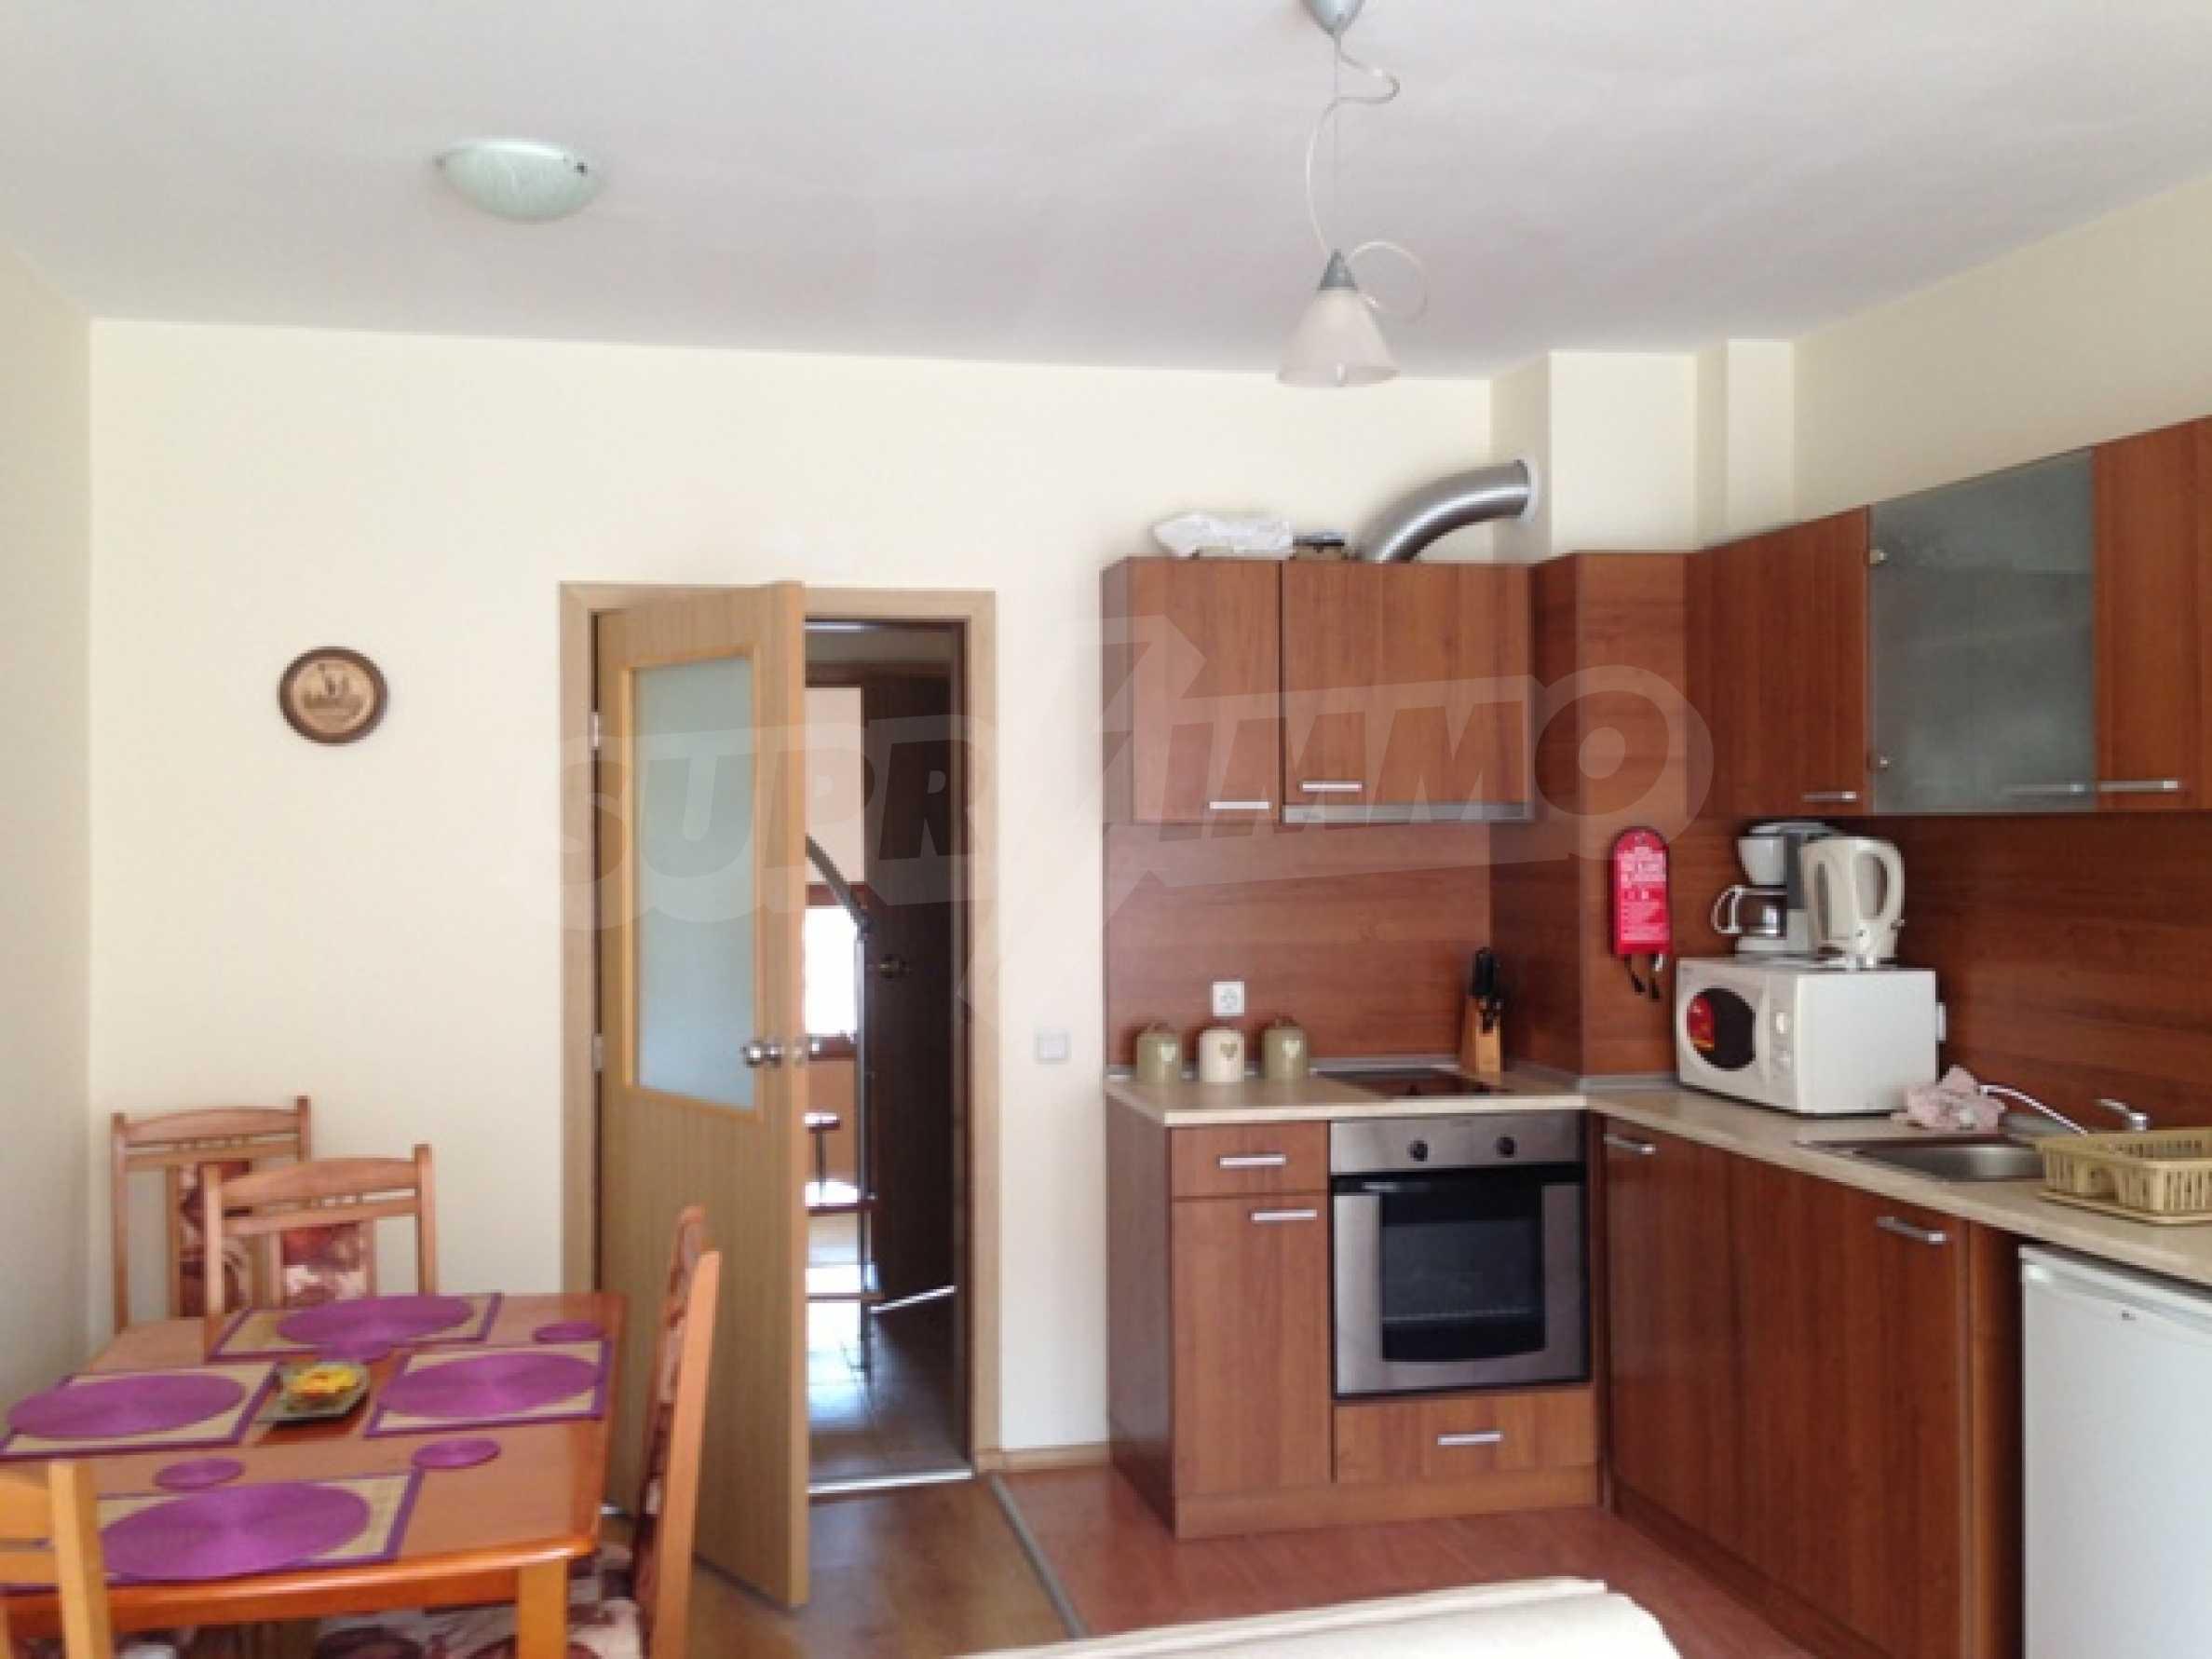 Тристаен апартамент в планински курорт Банско 4